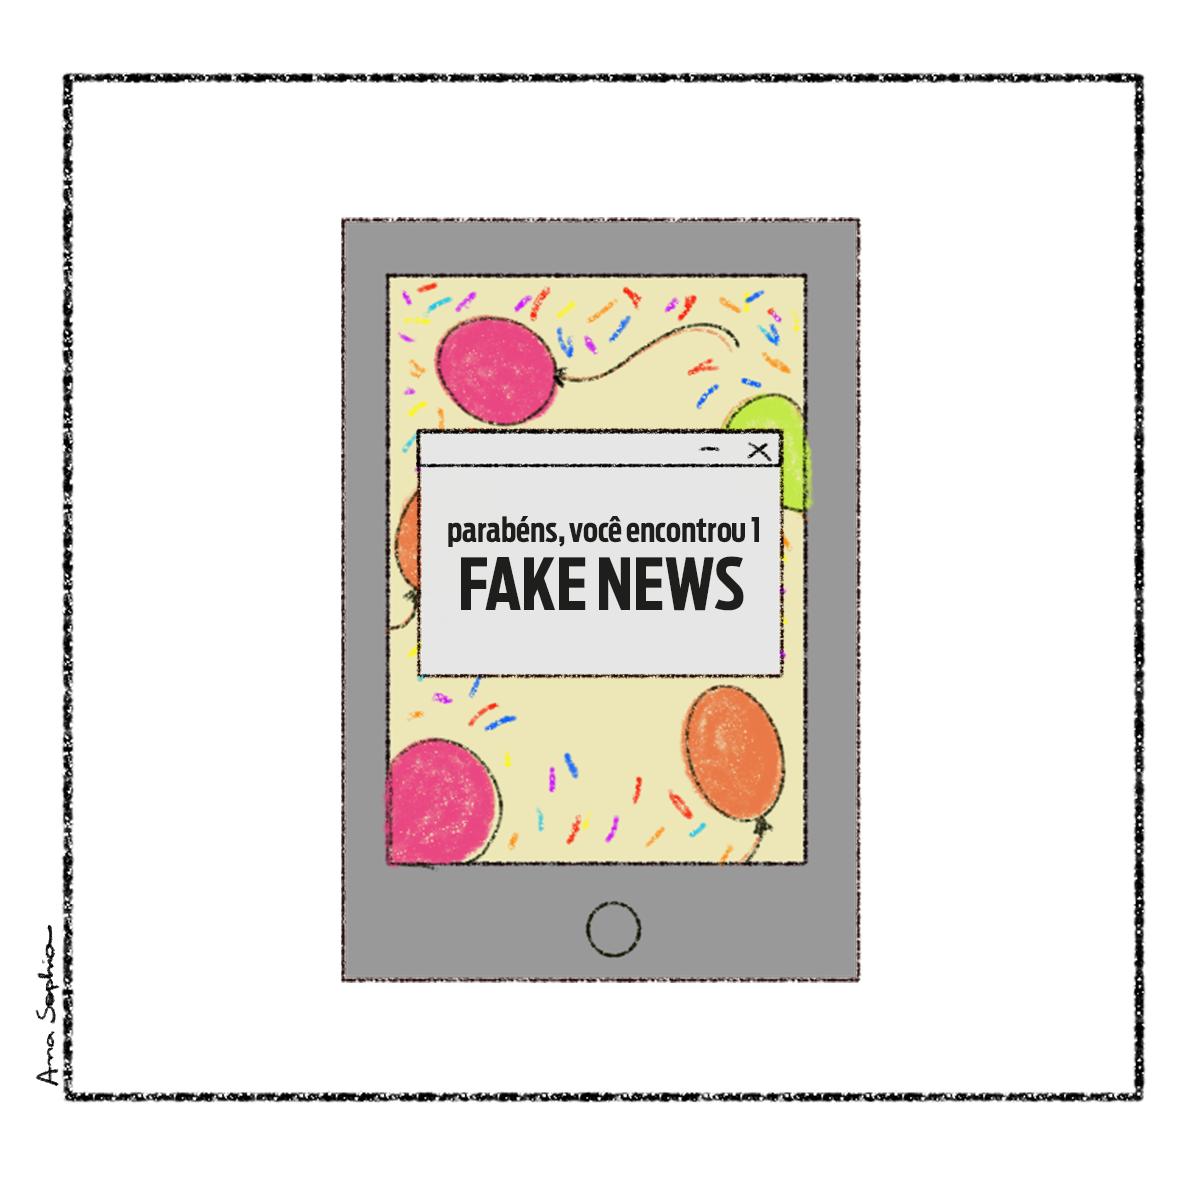 Viva as fake news!